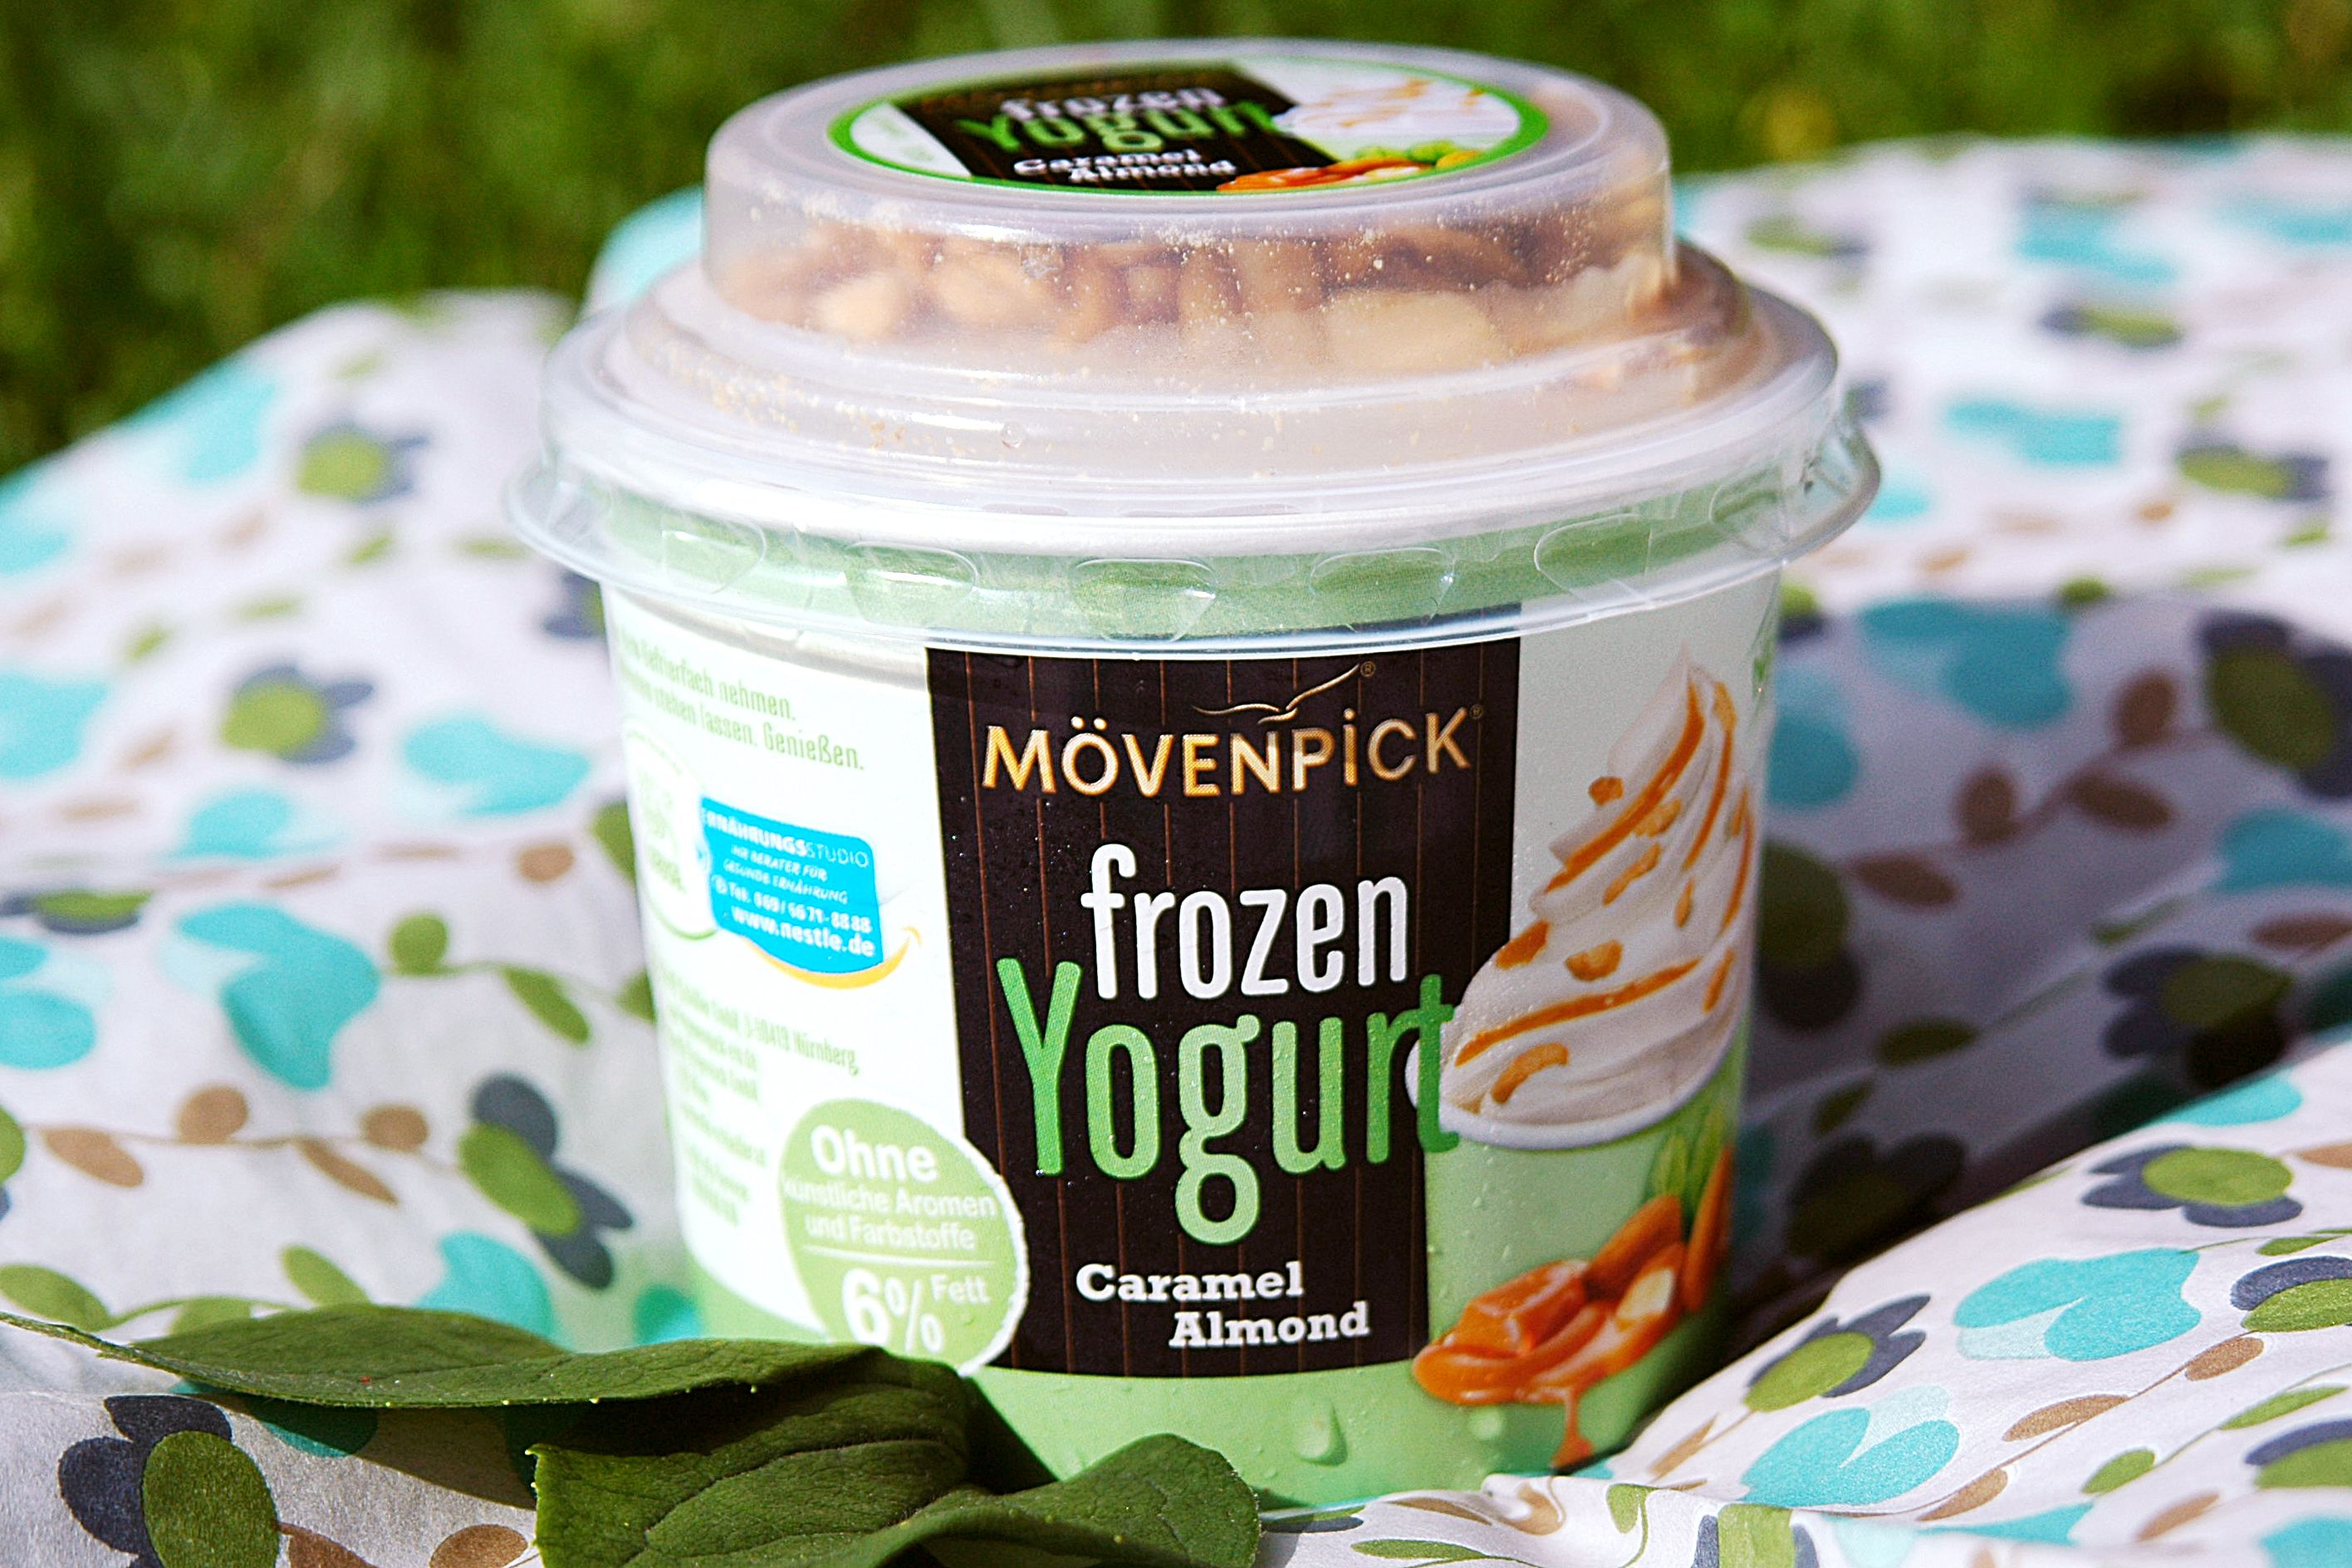 Mövenpick frozen Yogurt Caramel Almond #moevenpickeis #frozenyogurt #caramel #almond #sokanneissein #genussvollemomente